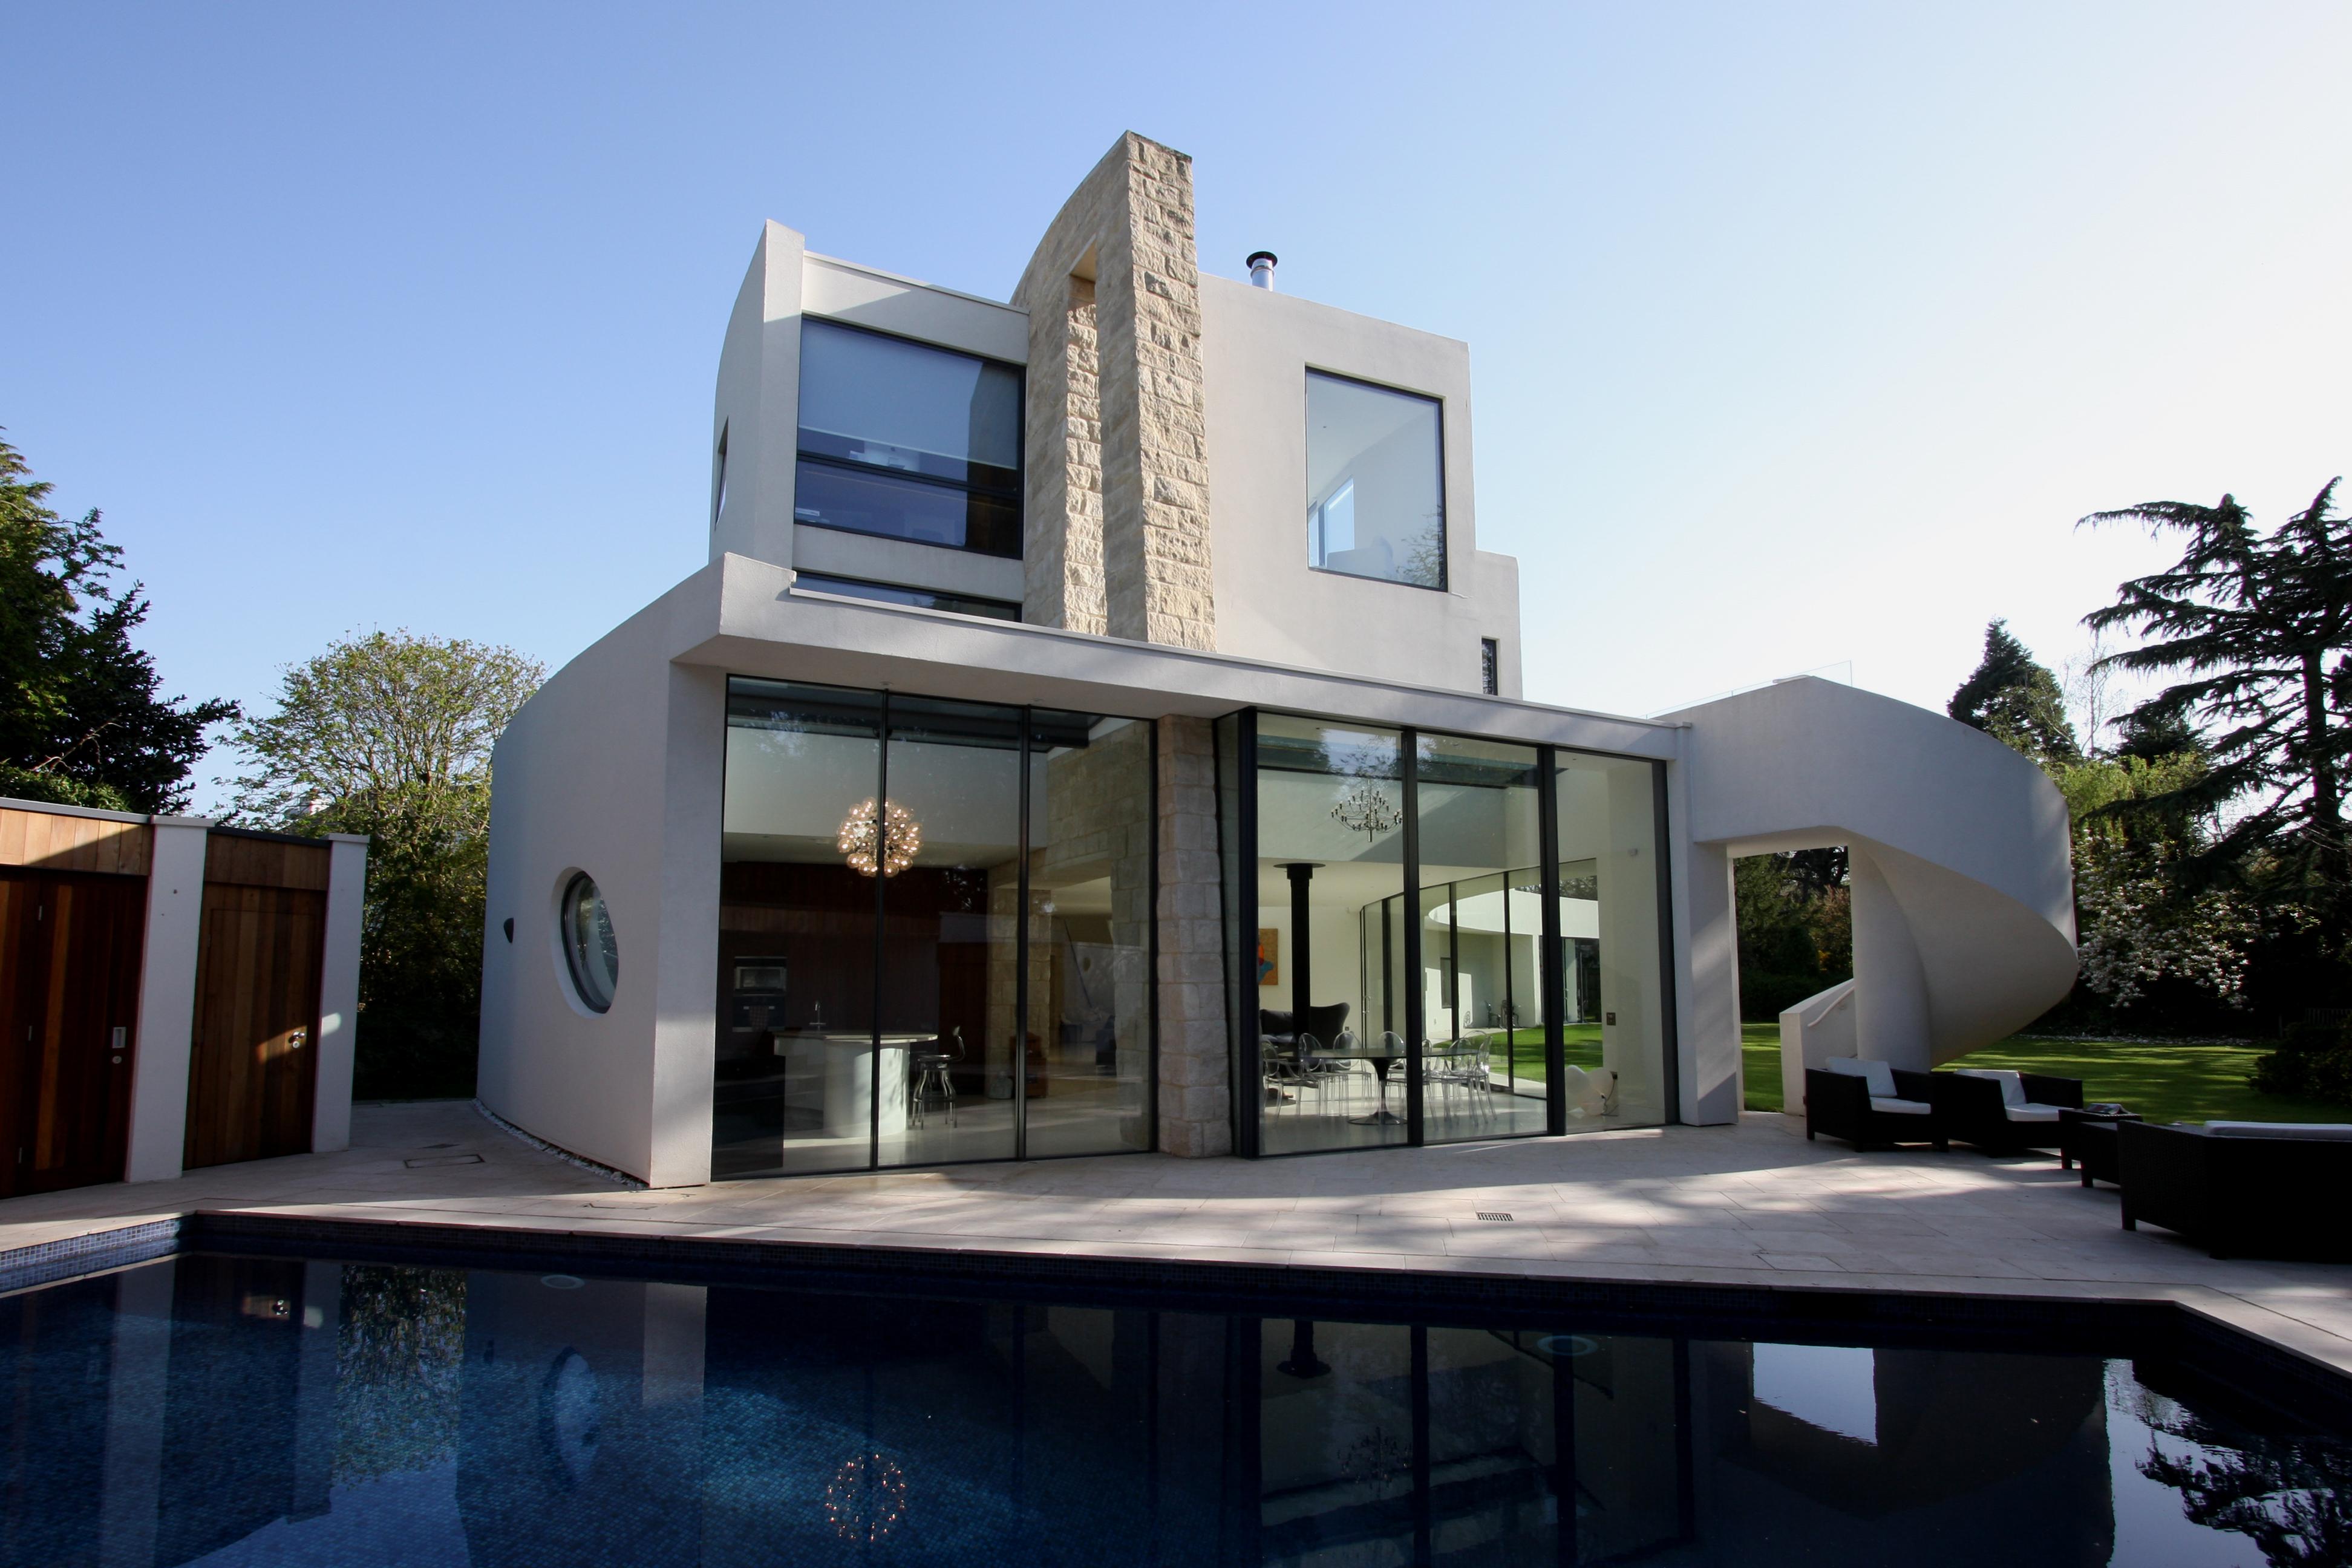 patio design ideas stamped concrete